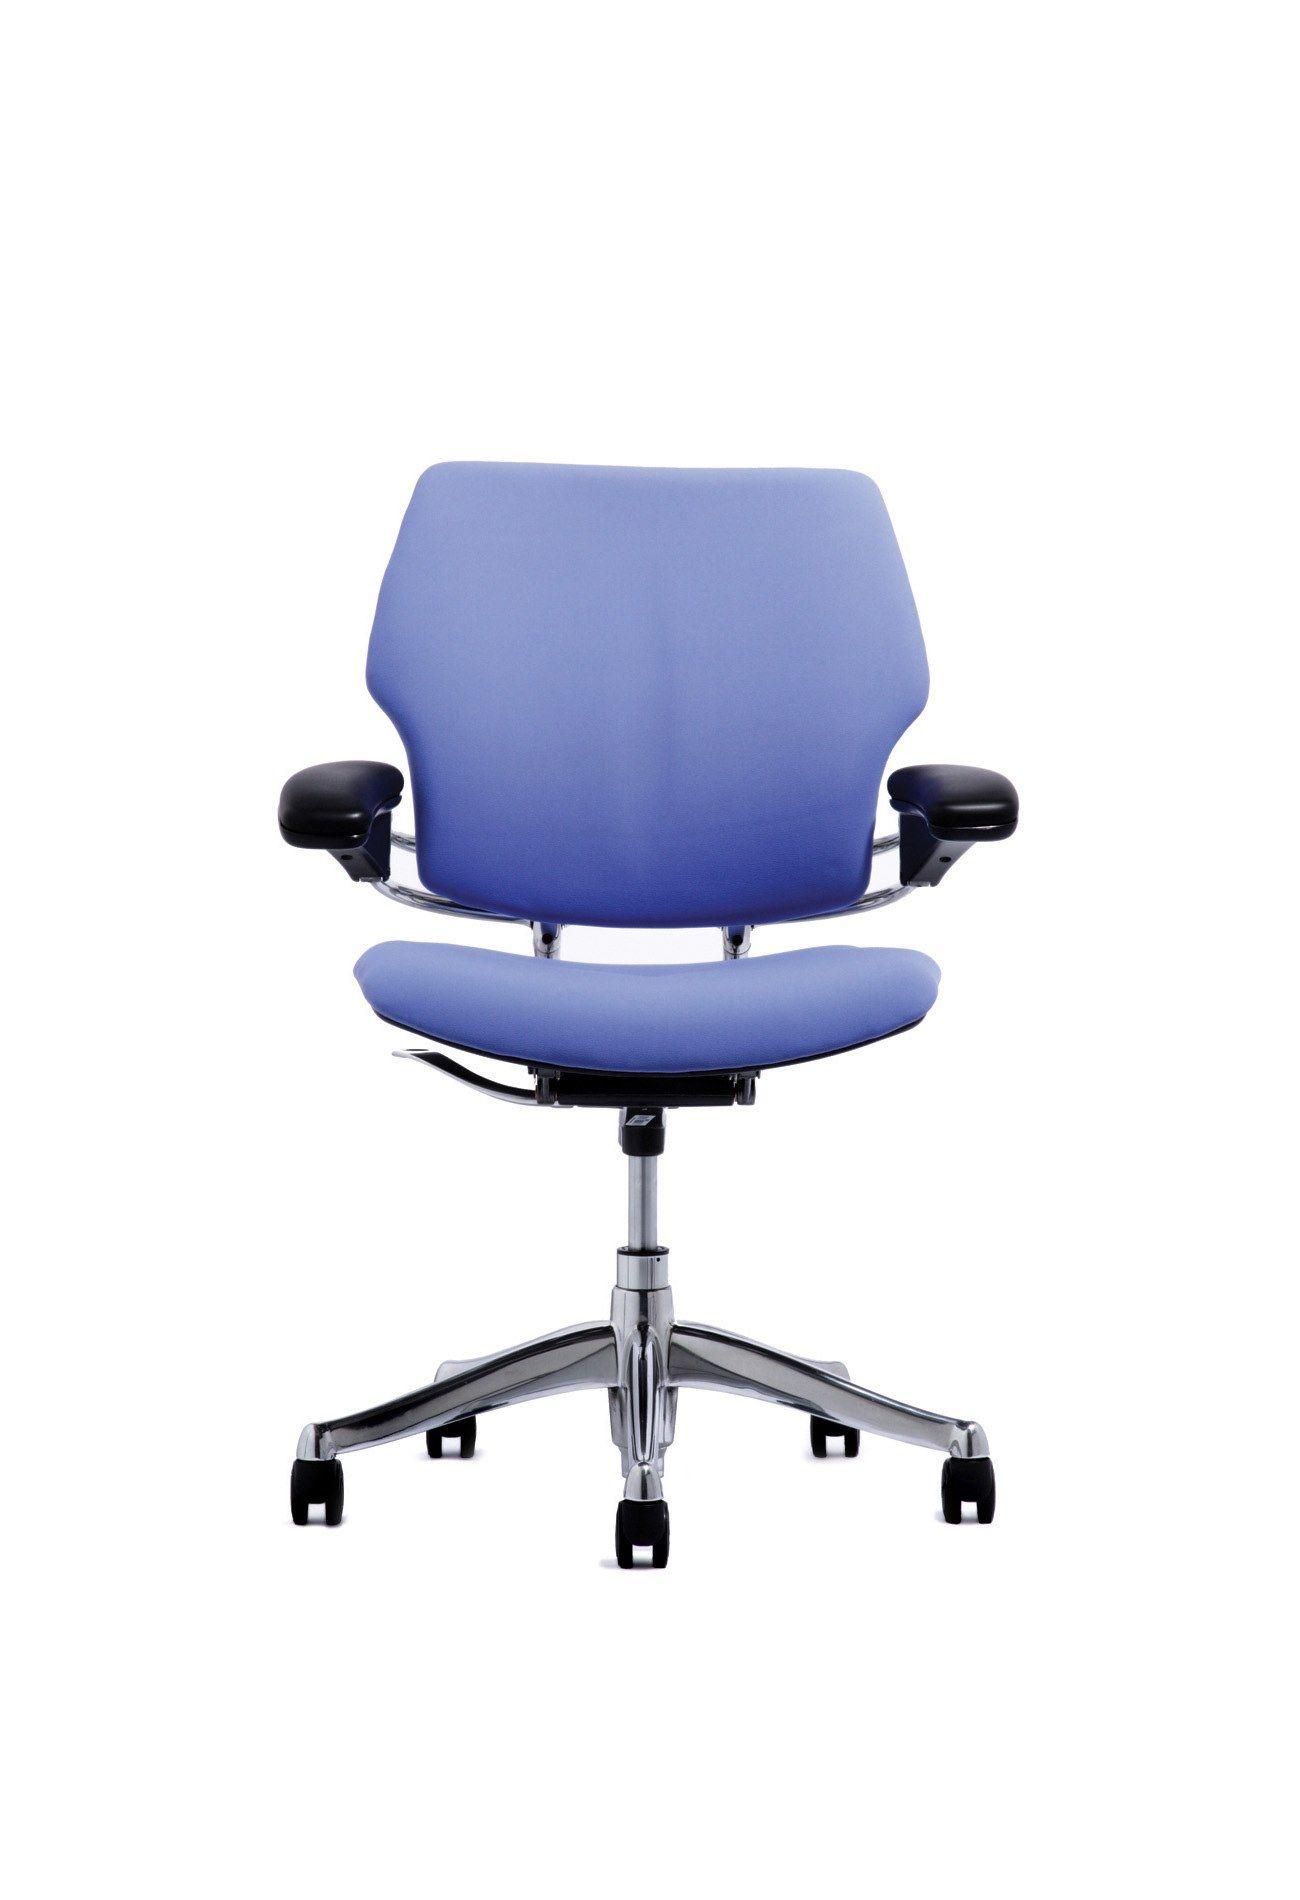 Humanscale freedom task chair blue chair task chair